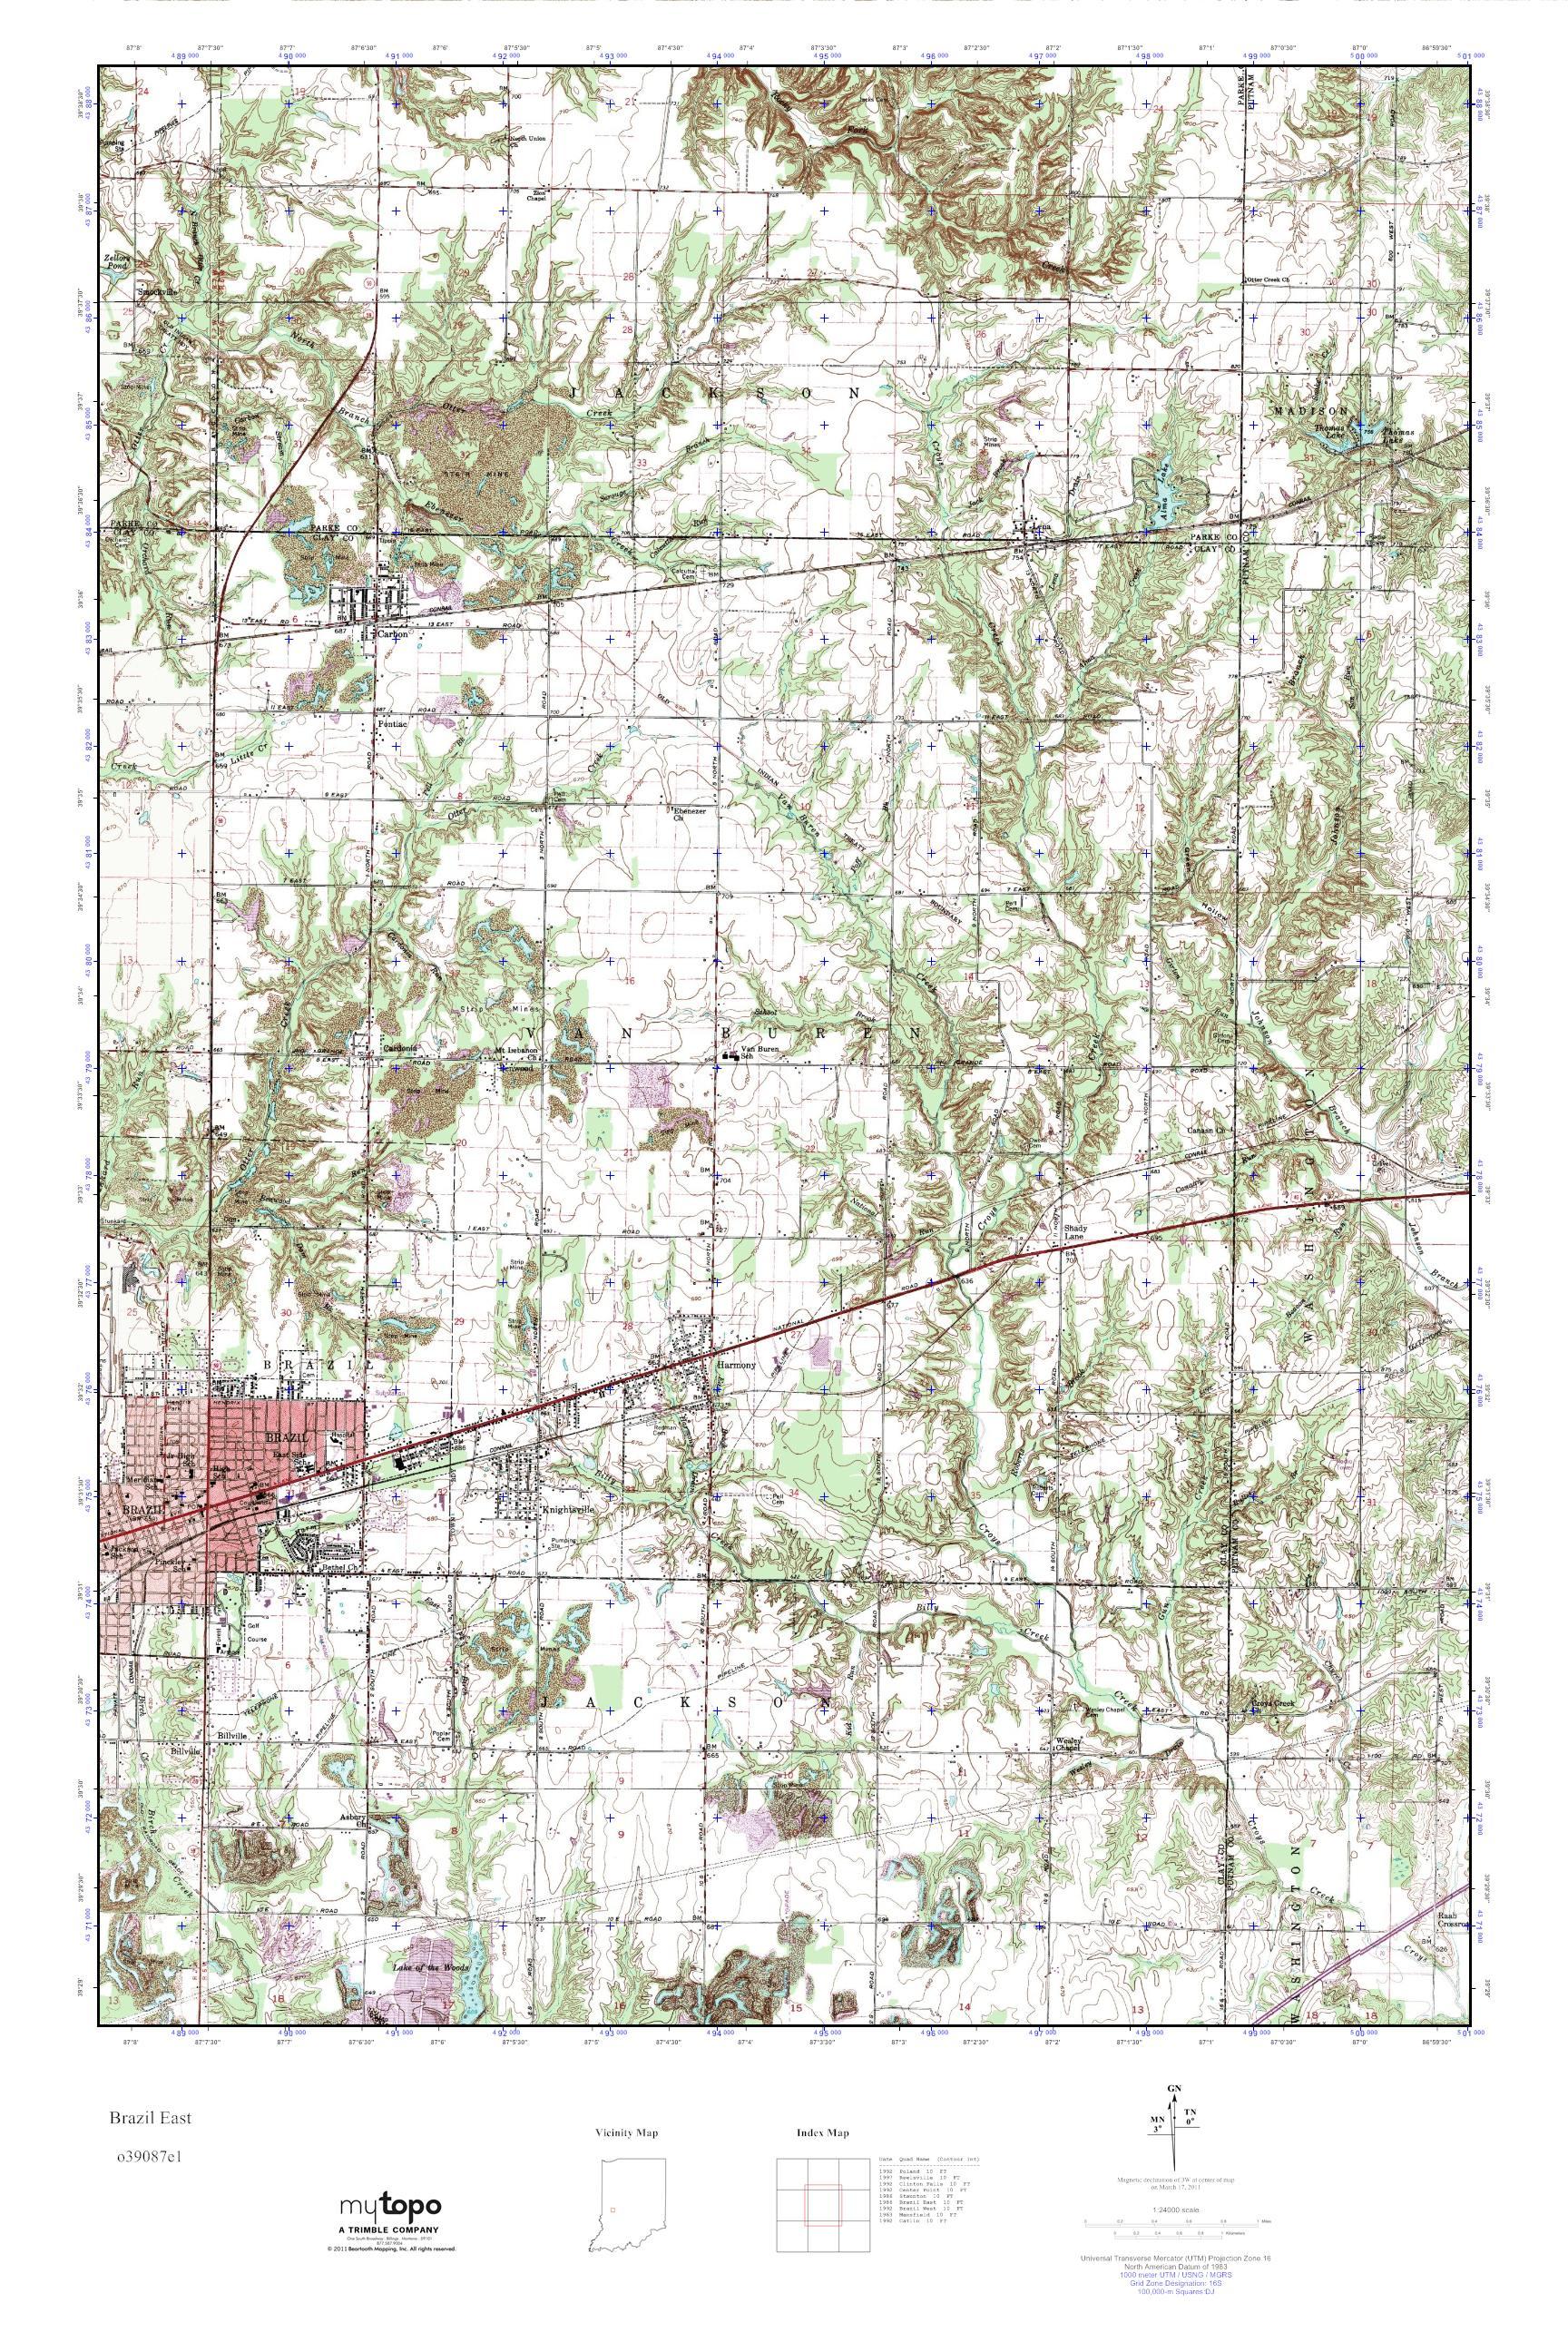 Mytopo Brazil East Indiana Usgs Quad Topo Map